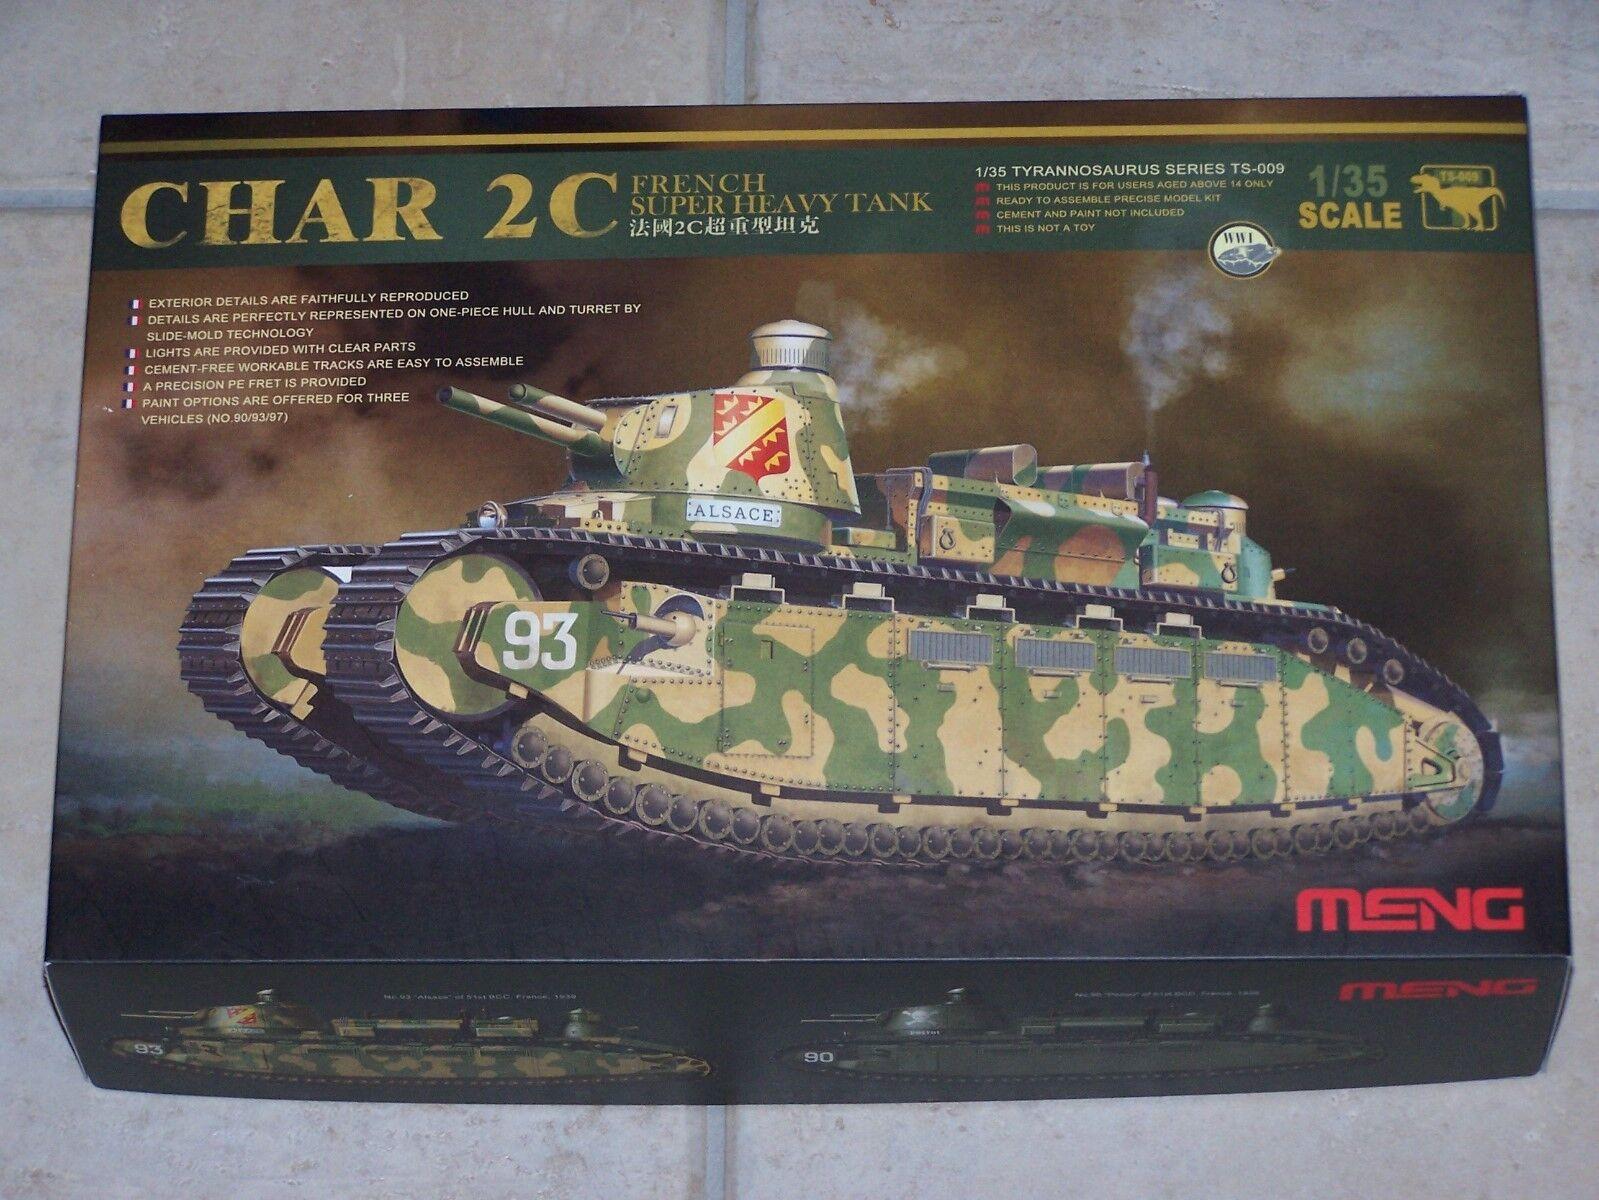 Maquette MENG 1 35ème CHAR 2C TYRANNOSAURUS SERIES TS-009